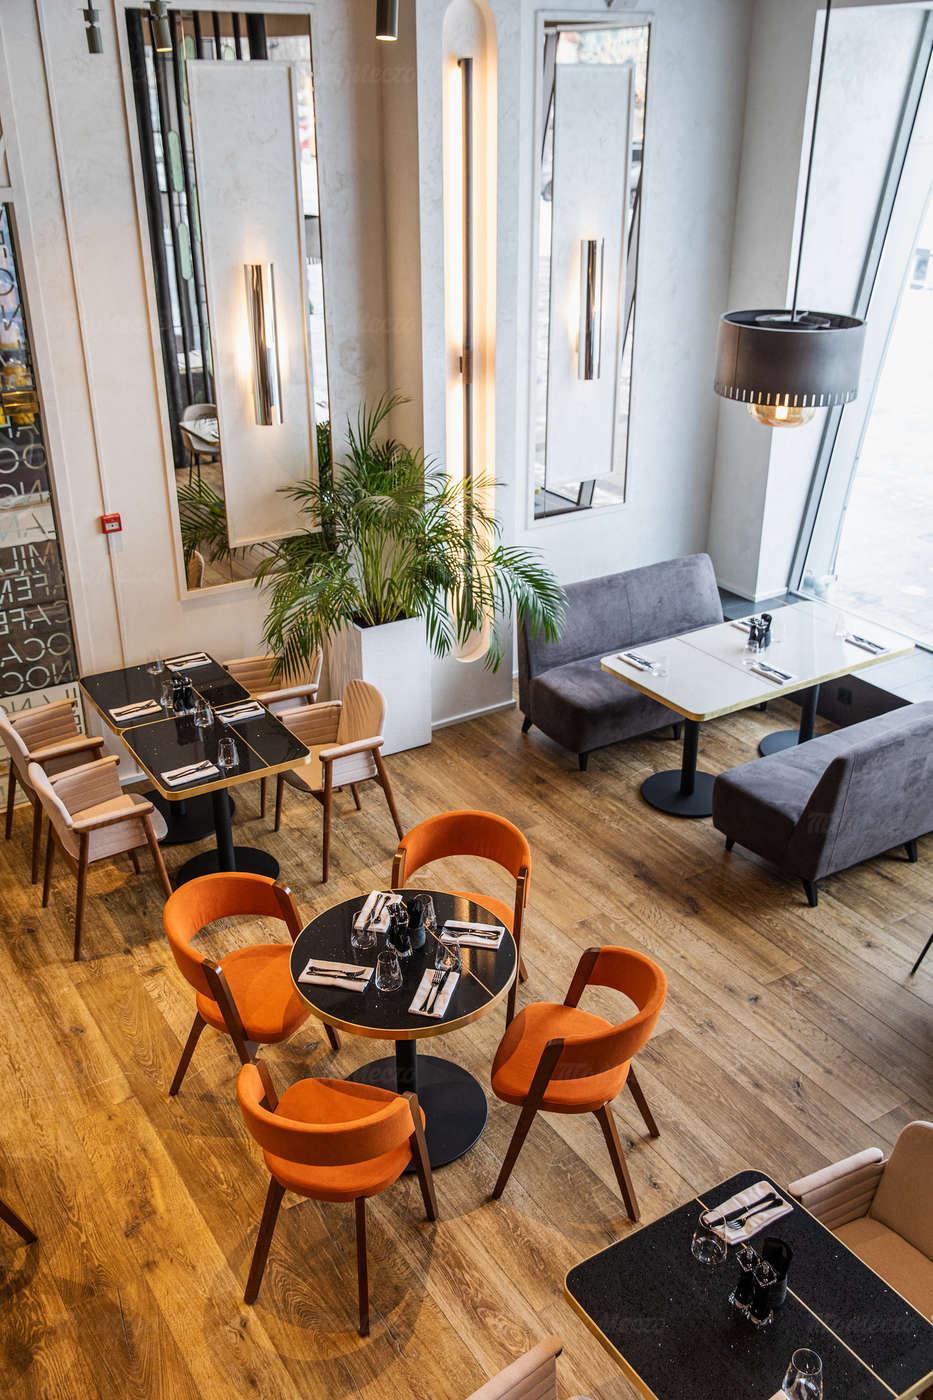 Ресторан Cafe Milano (Милано) на Новом Арбате фото 6